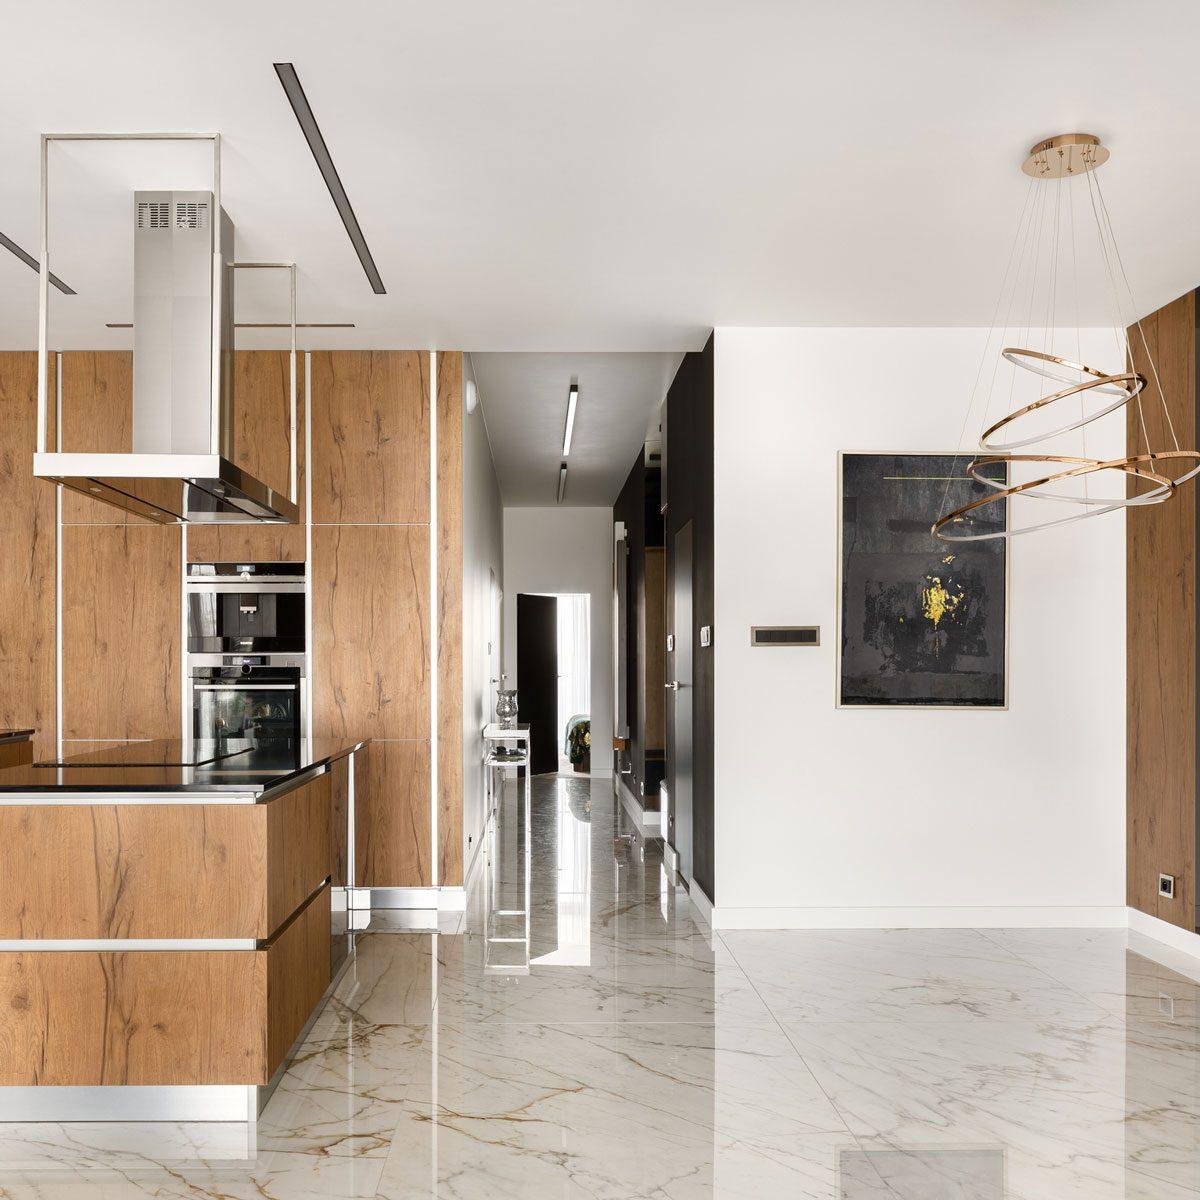 Kitchen with marble floor